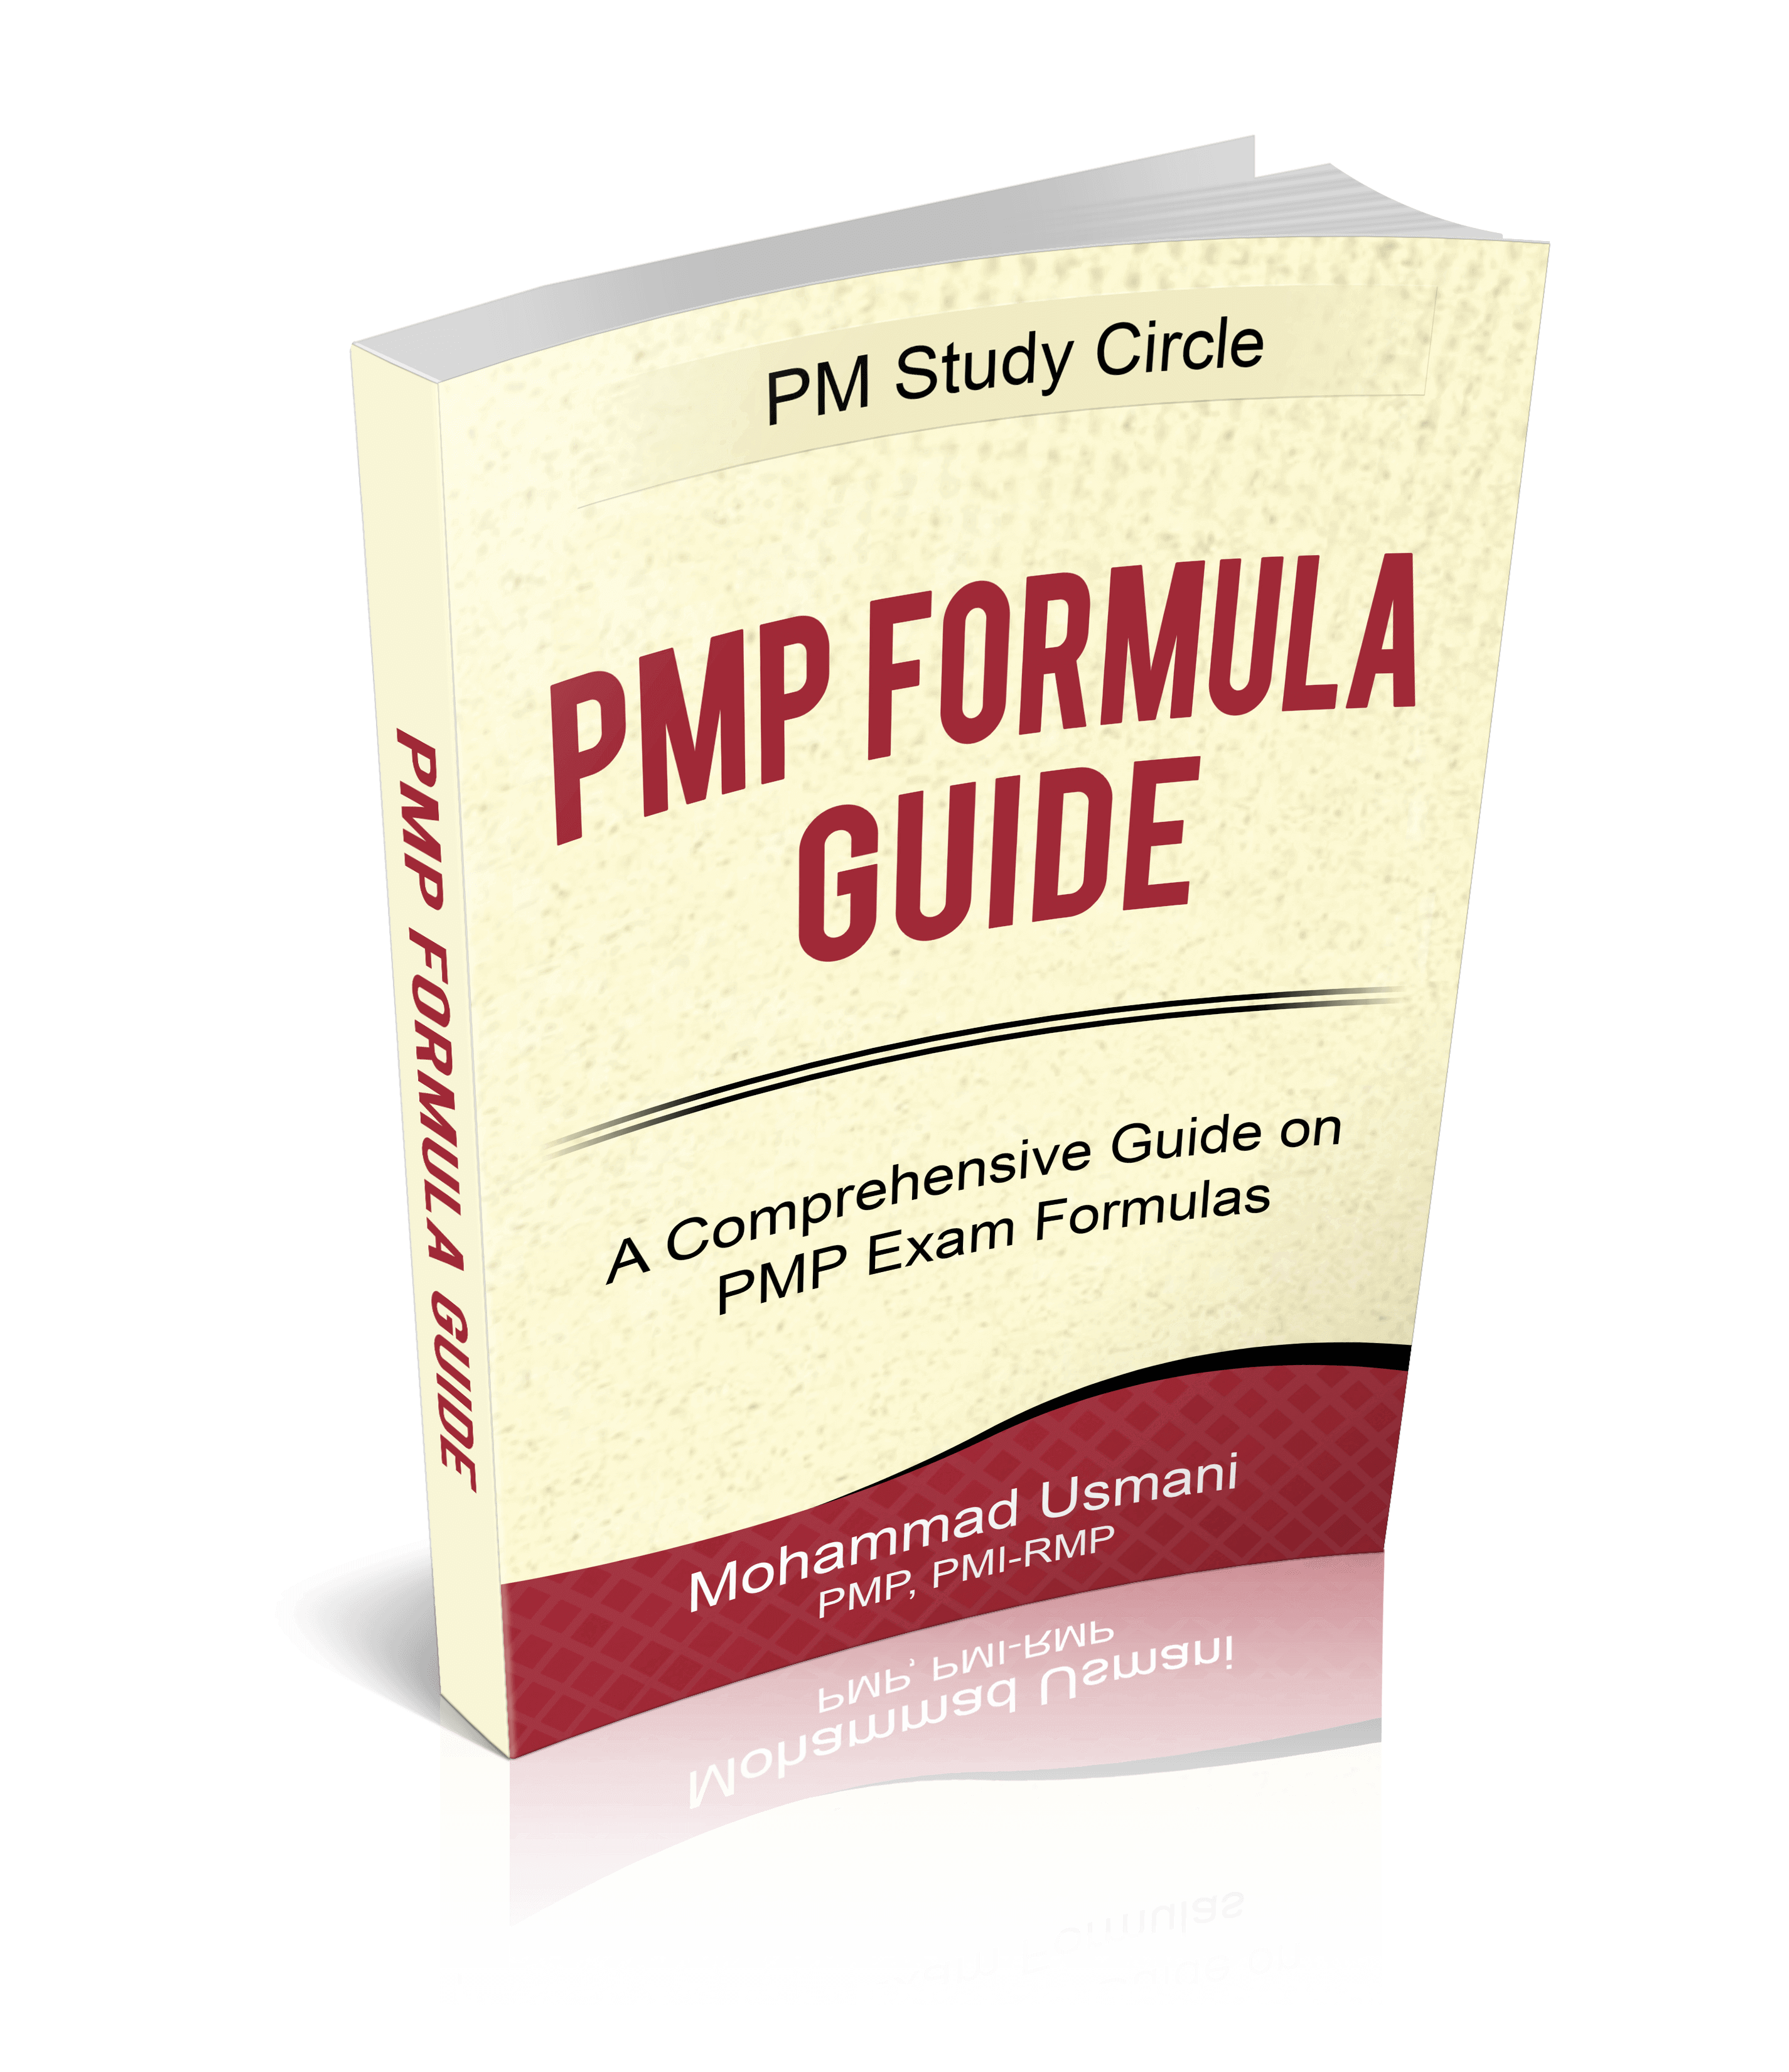 PMP Formula Guide 3D